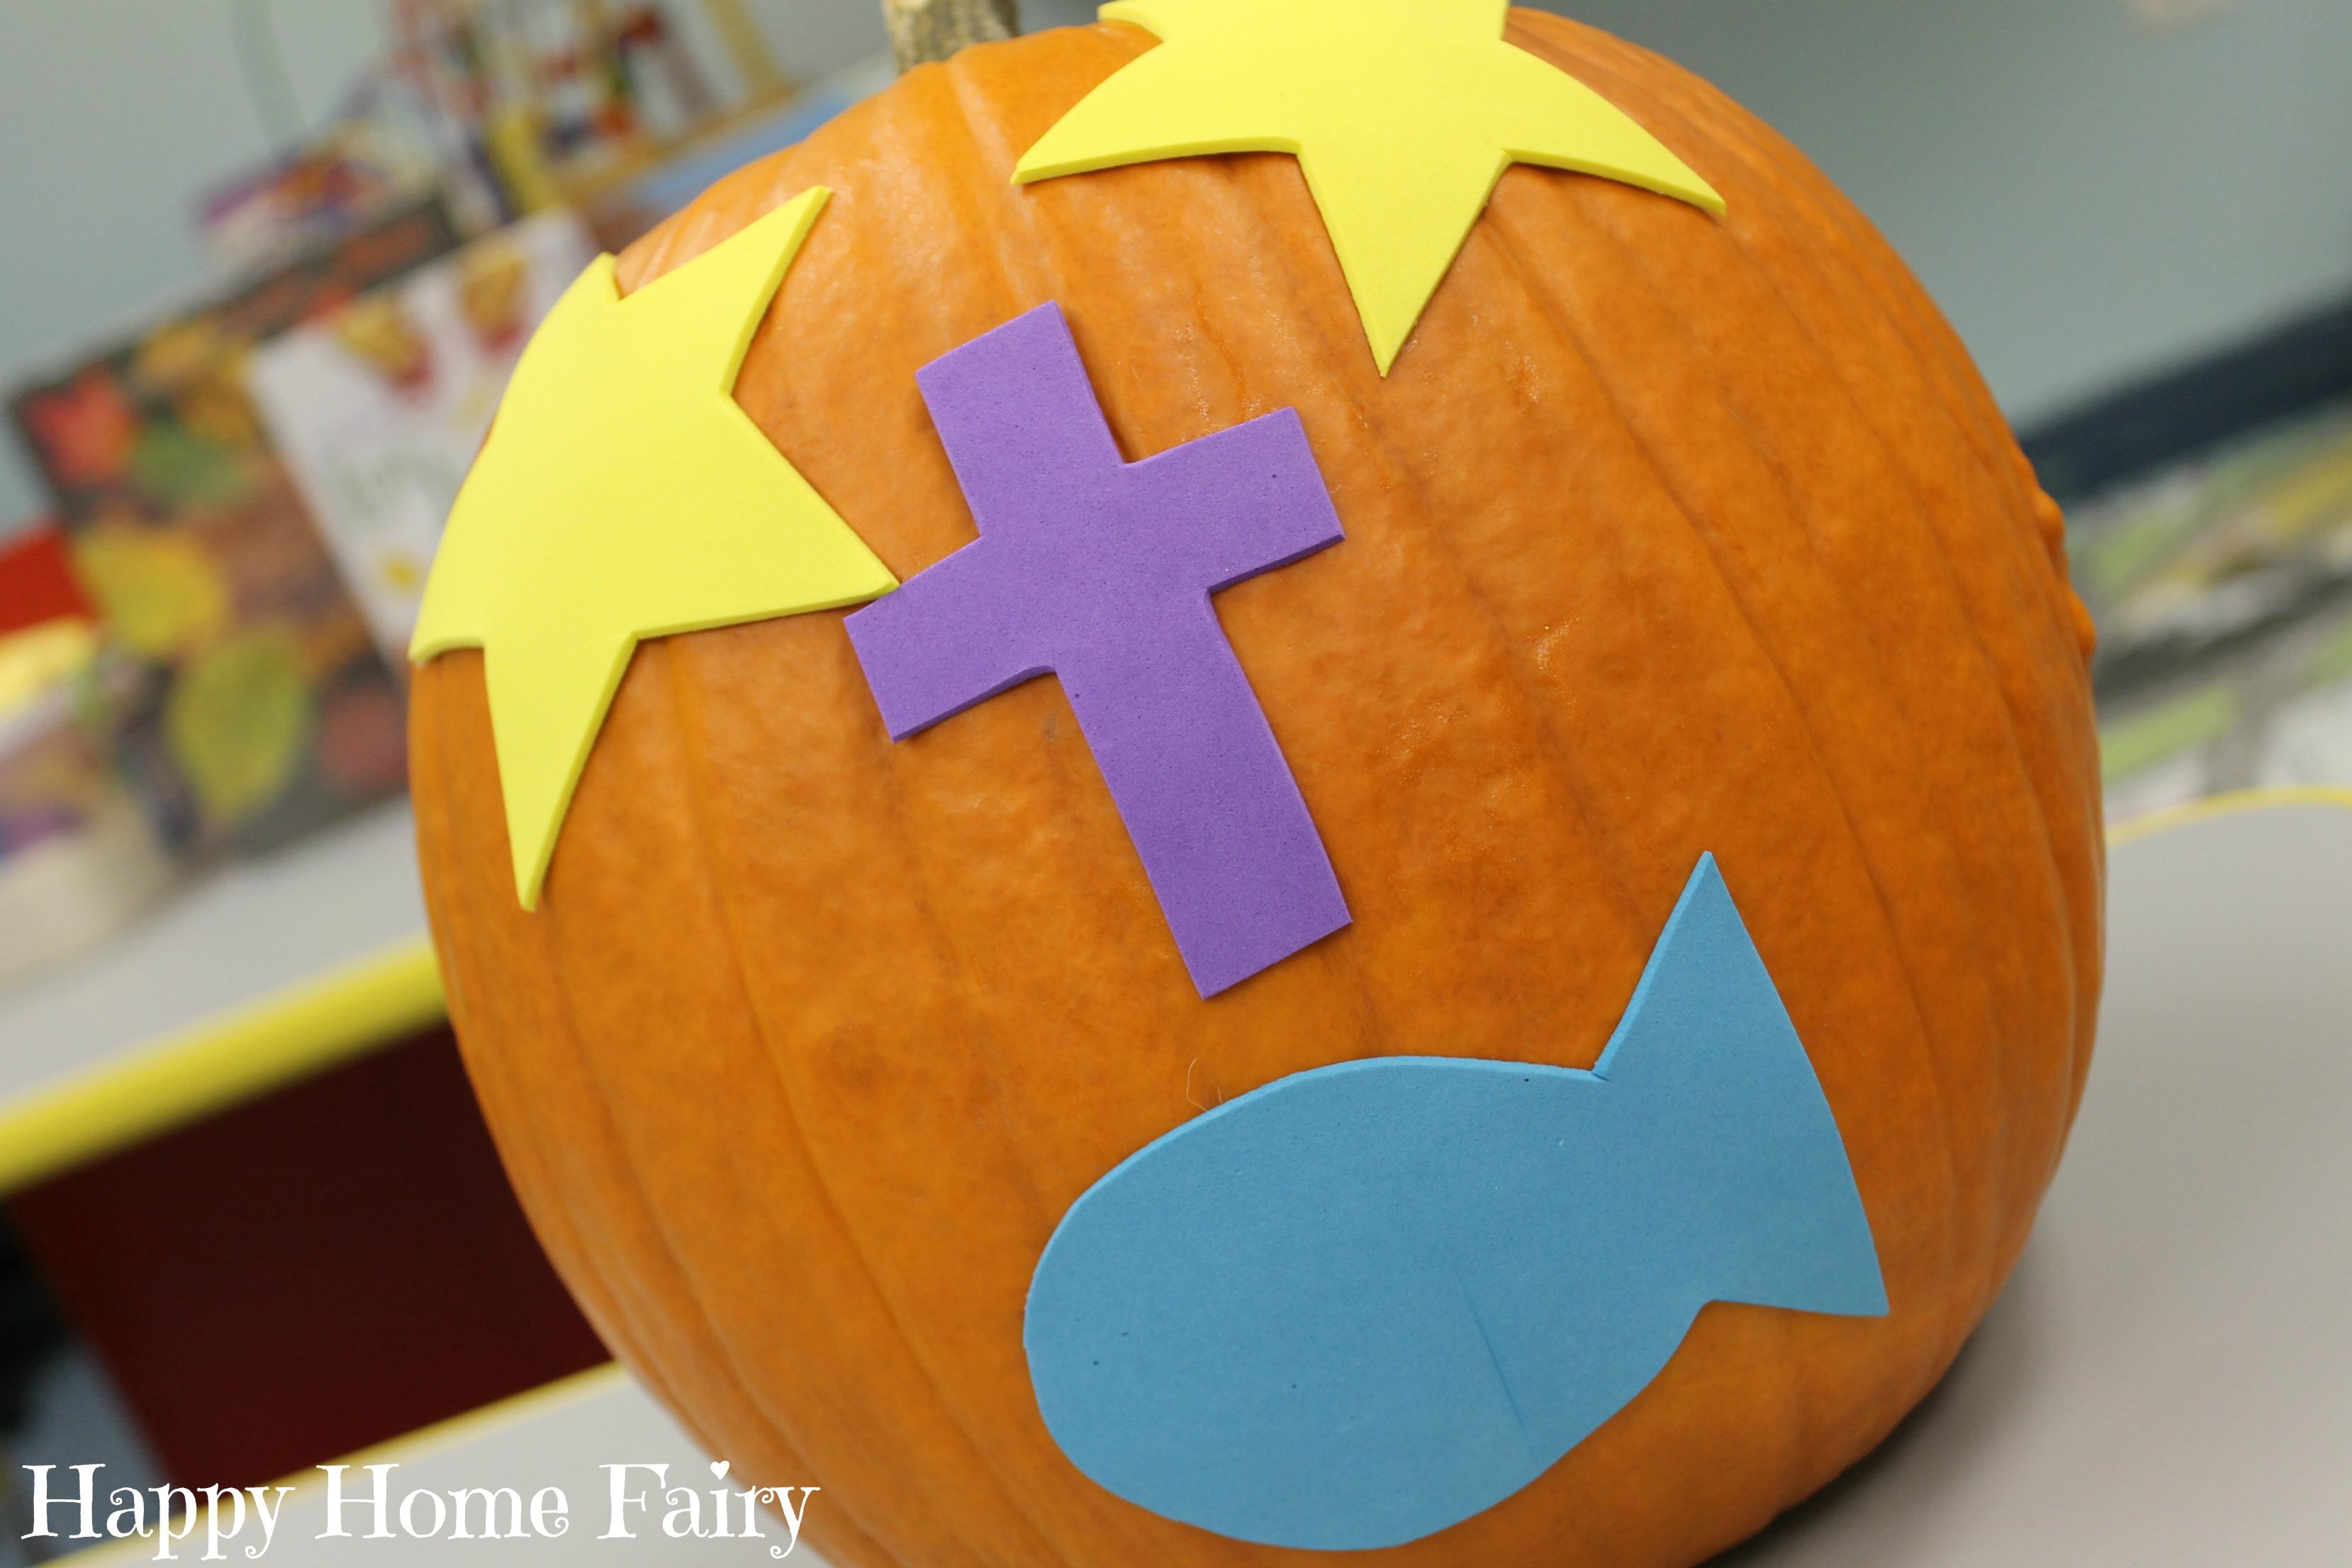 the gospel pumpkin - free printable